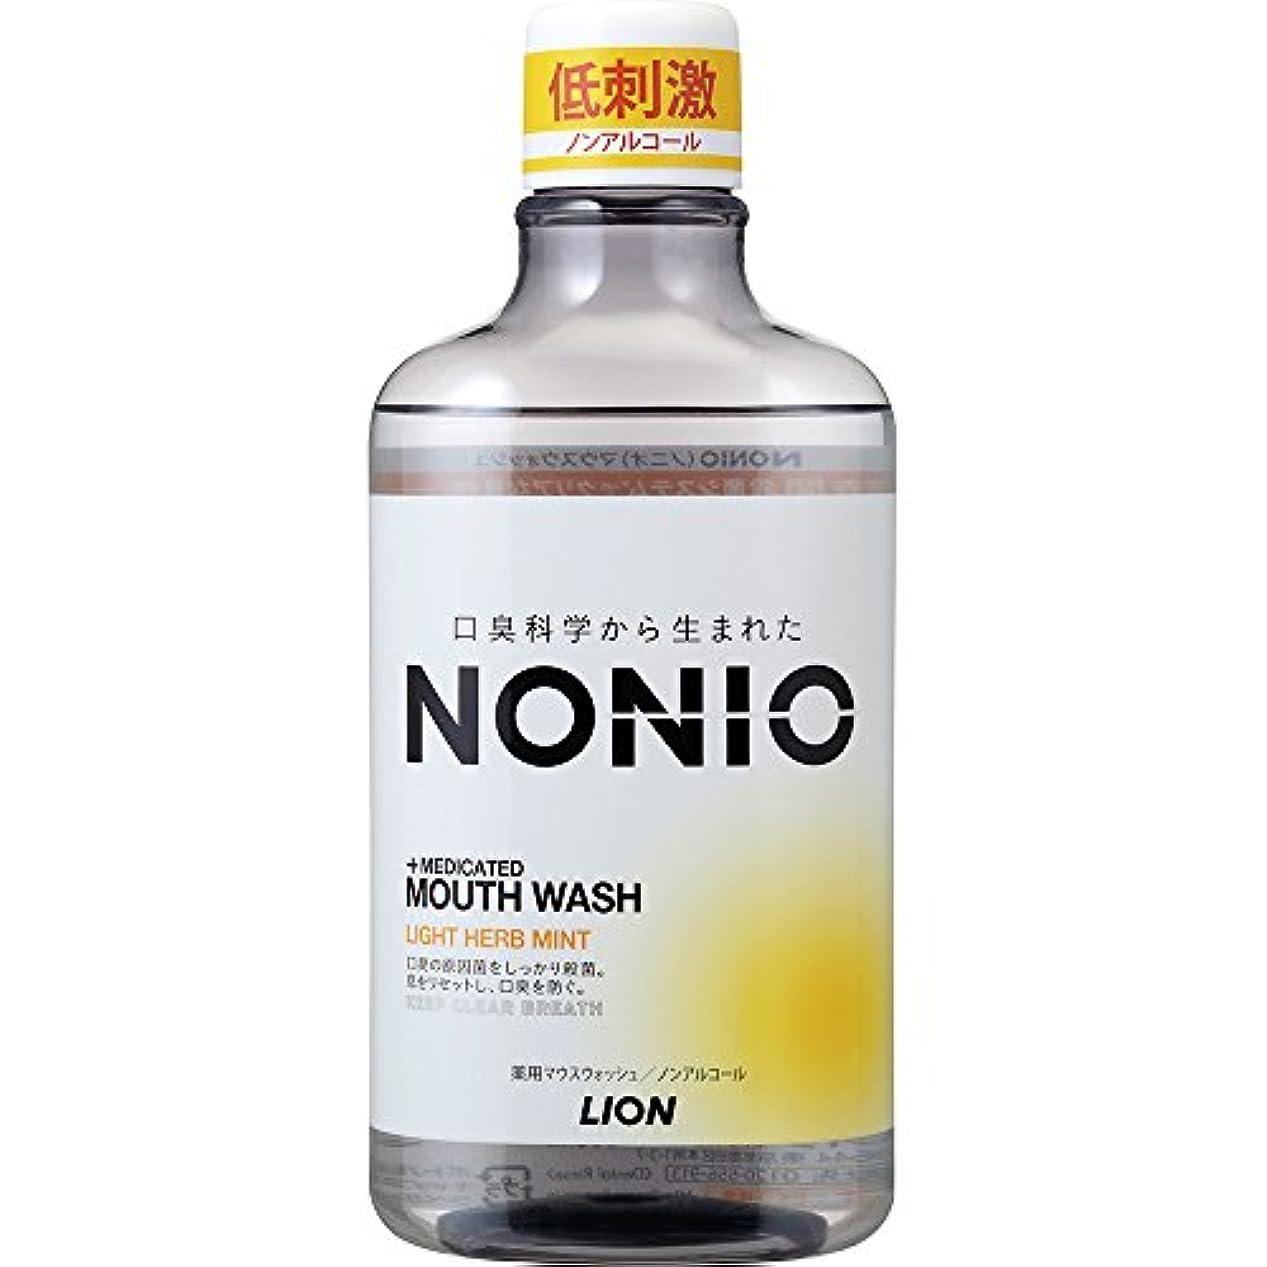 NONIO マウスウォッシュ ノンアルコール ライトハーブミント 600ml 洗口液 (医薬部外品)